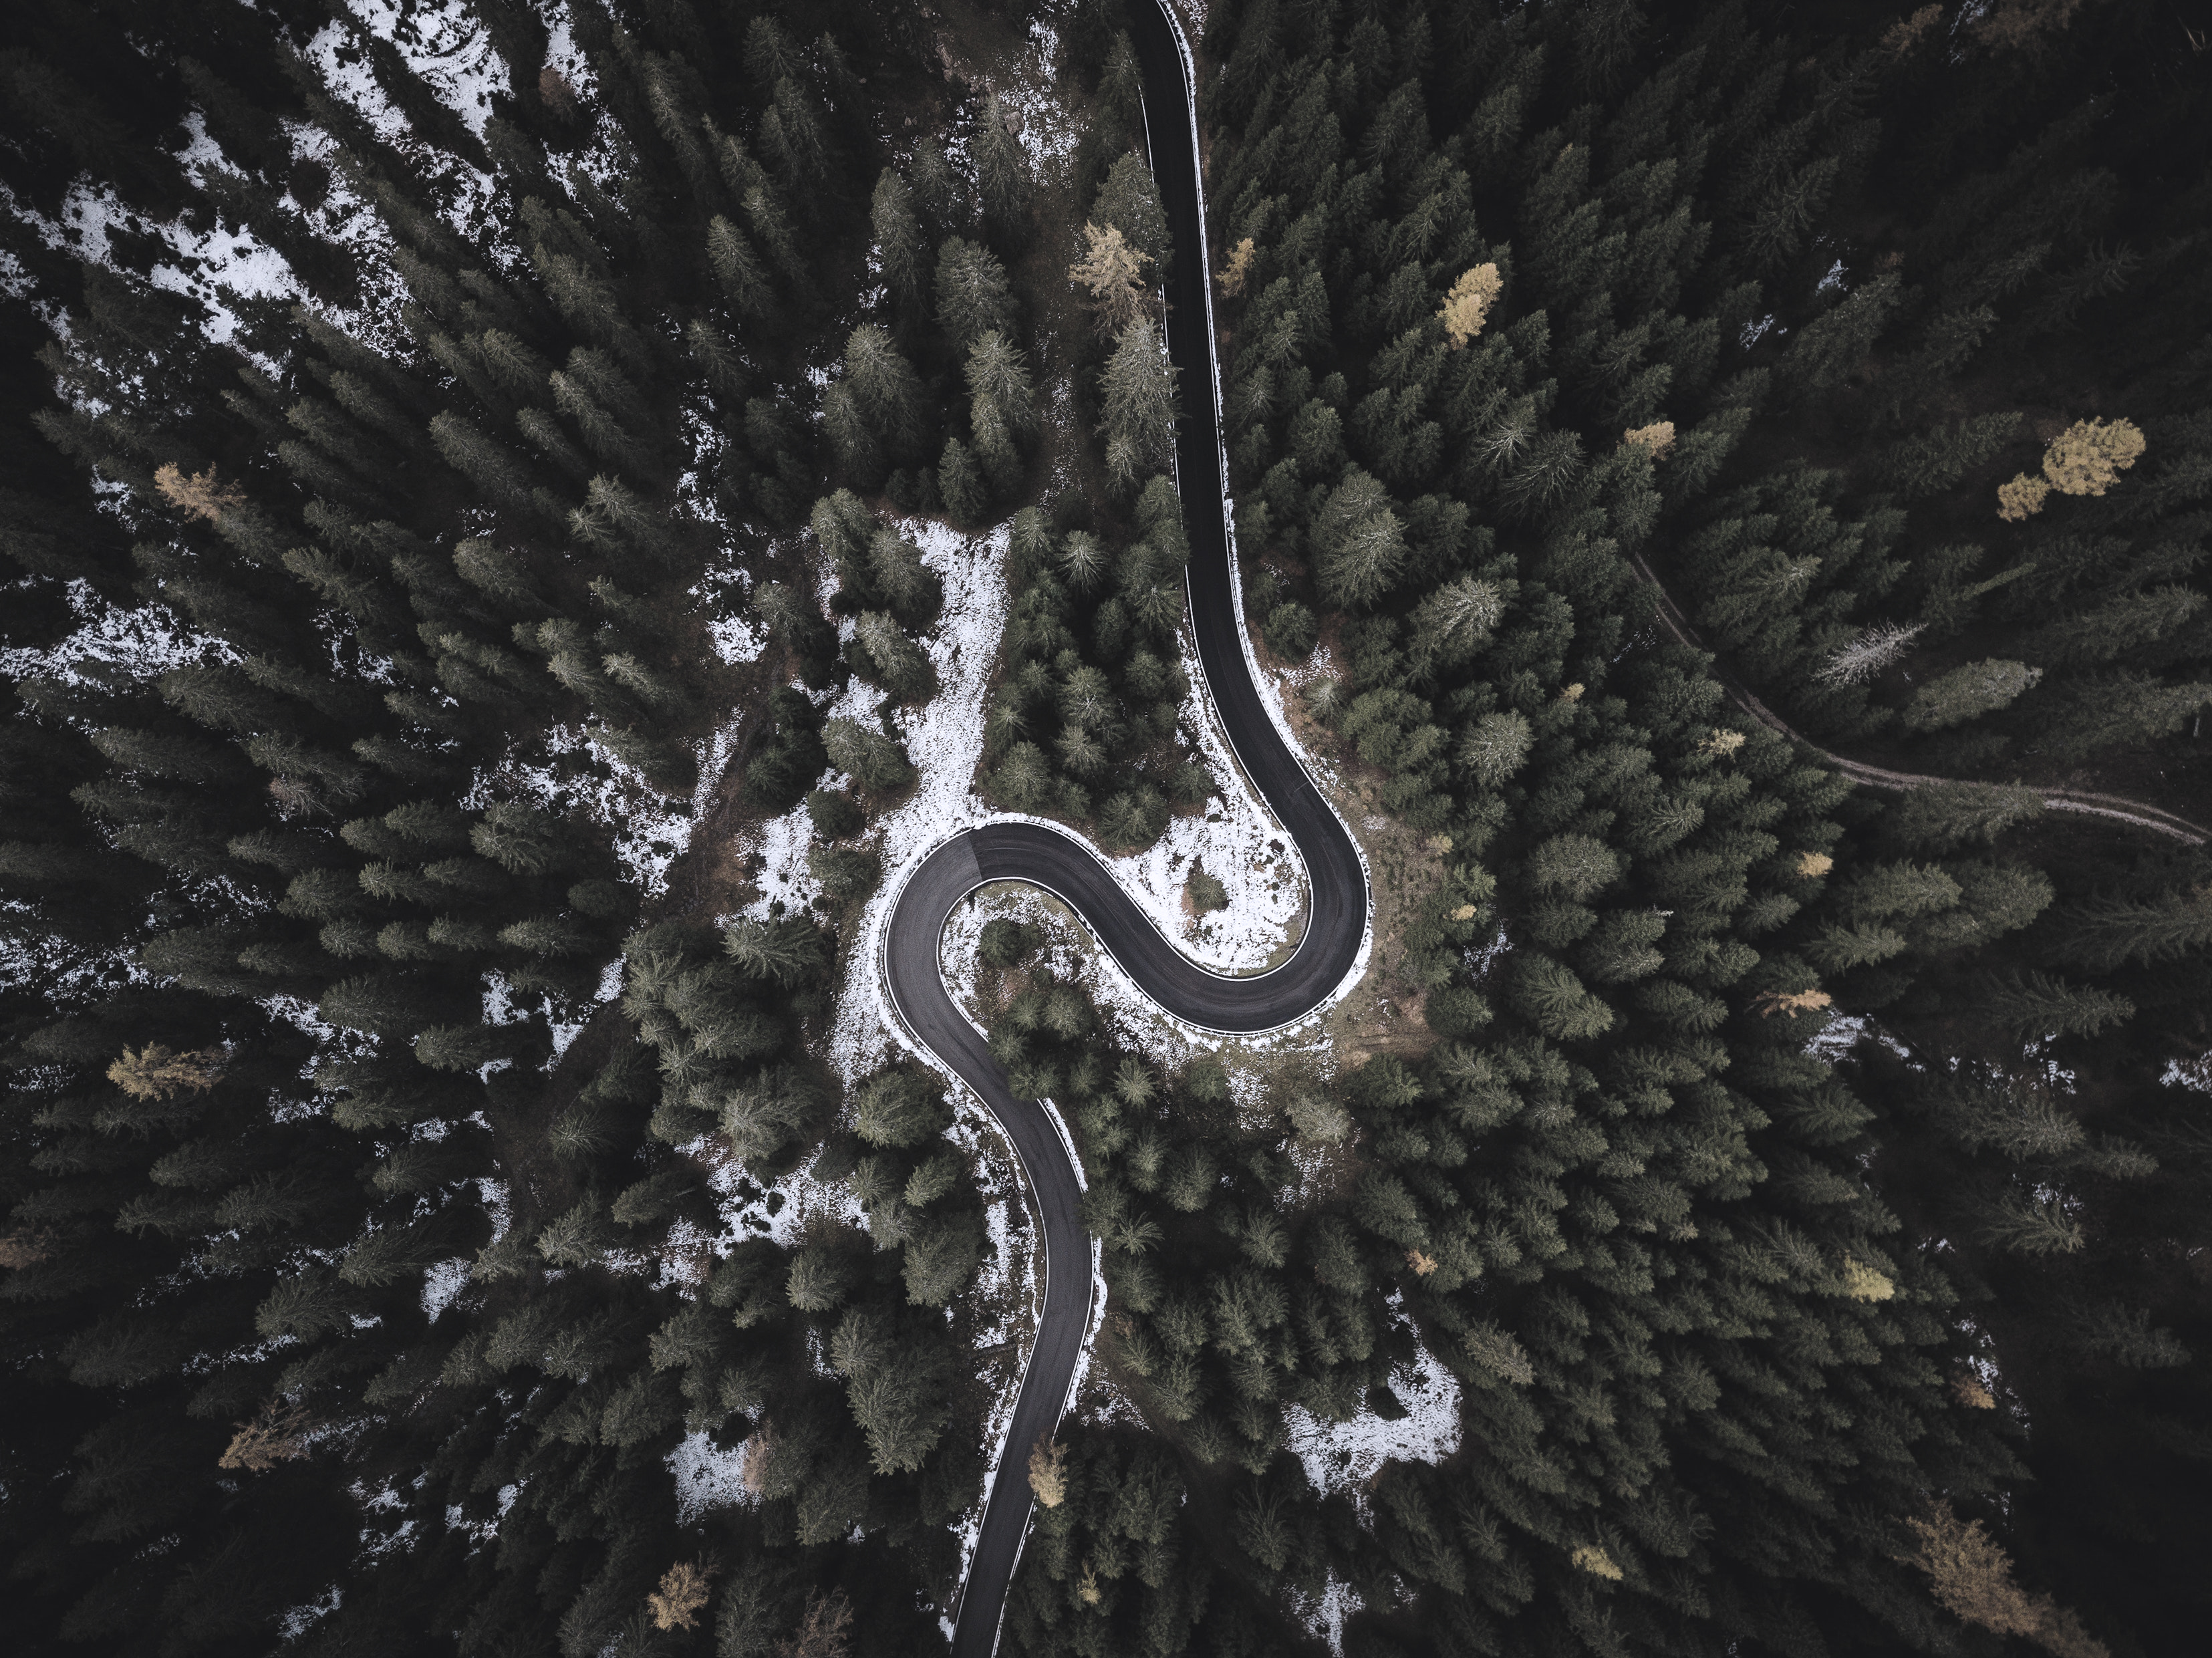 bird-s-eye-view-conifers-curve-1624600